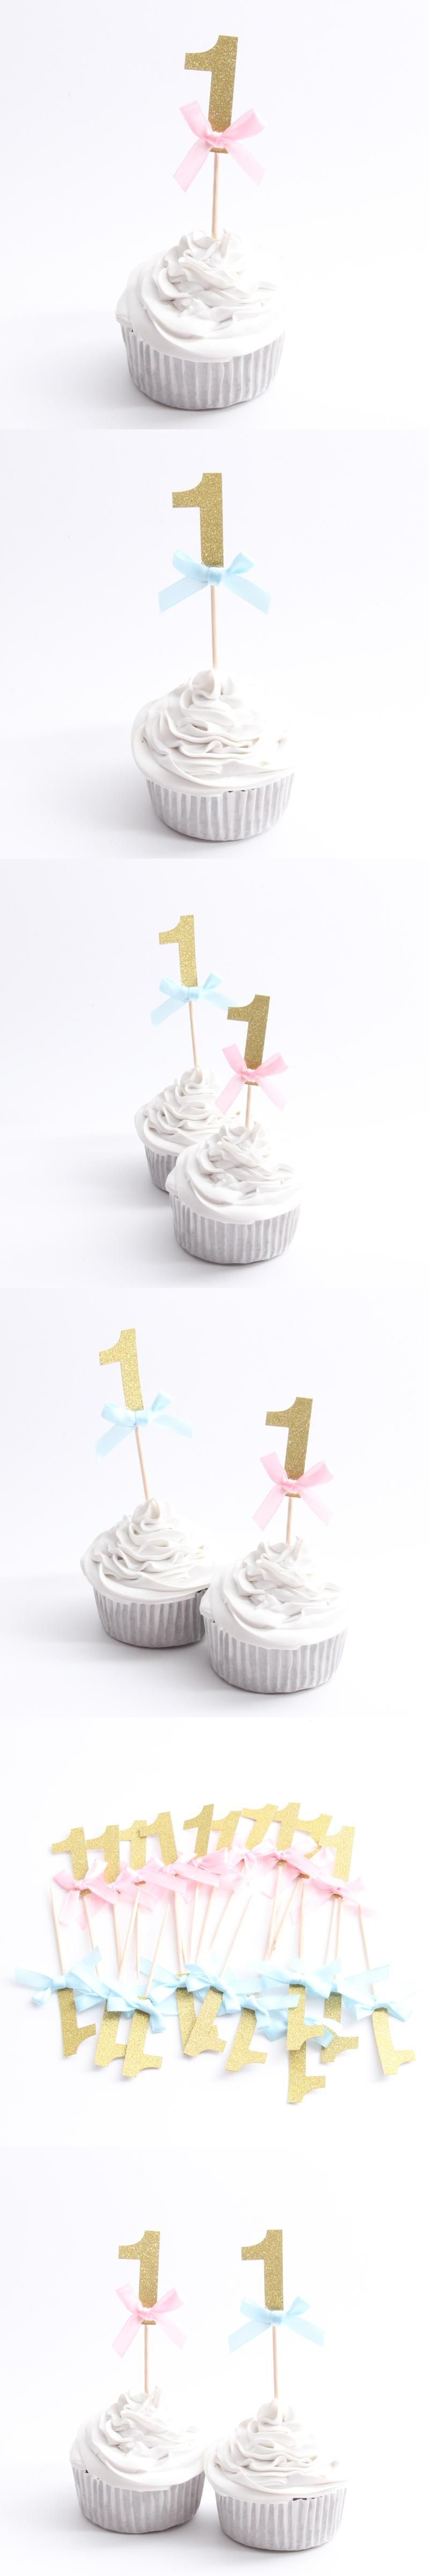 10pcs/lot Gold 1 Cupcake Topper Theme Cartoon Party Supplies Kids ...